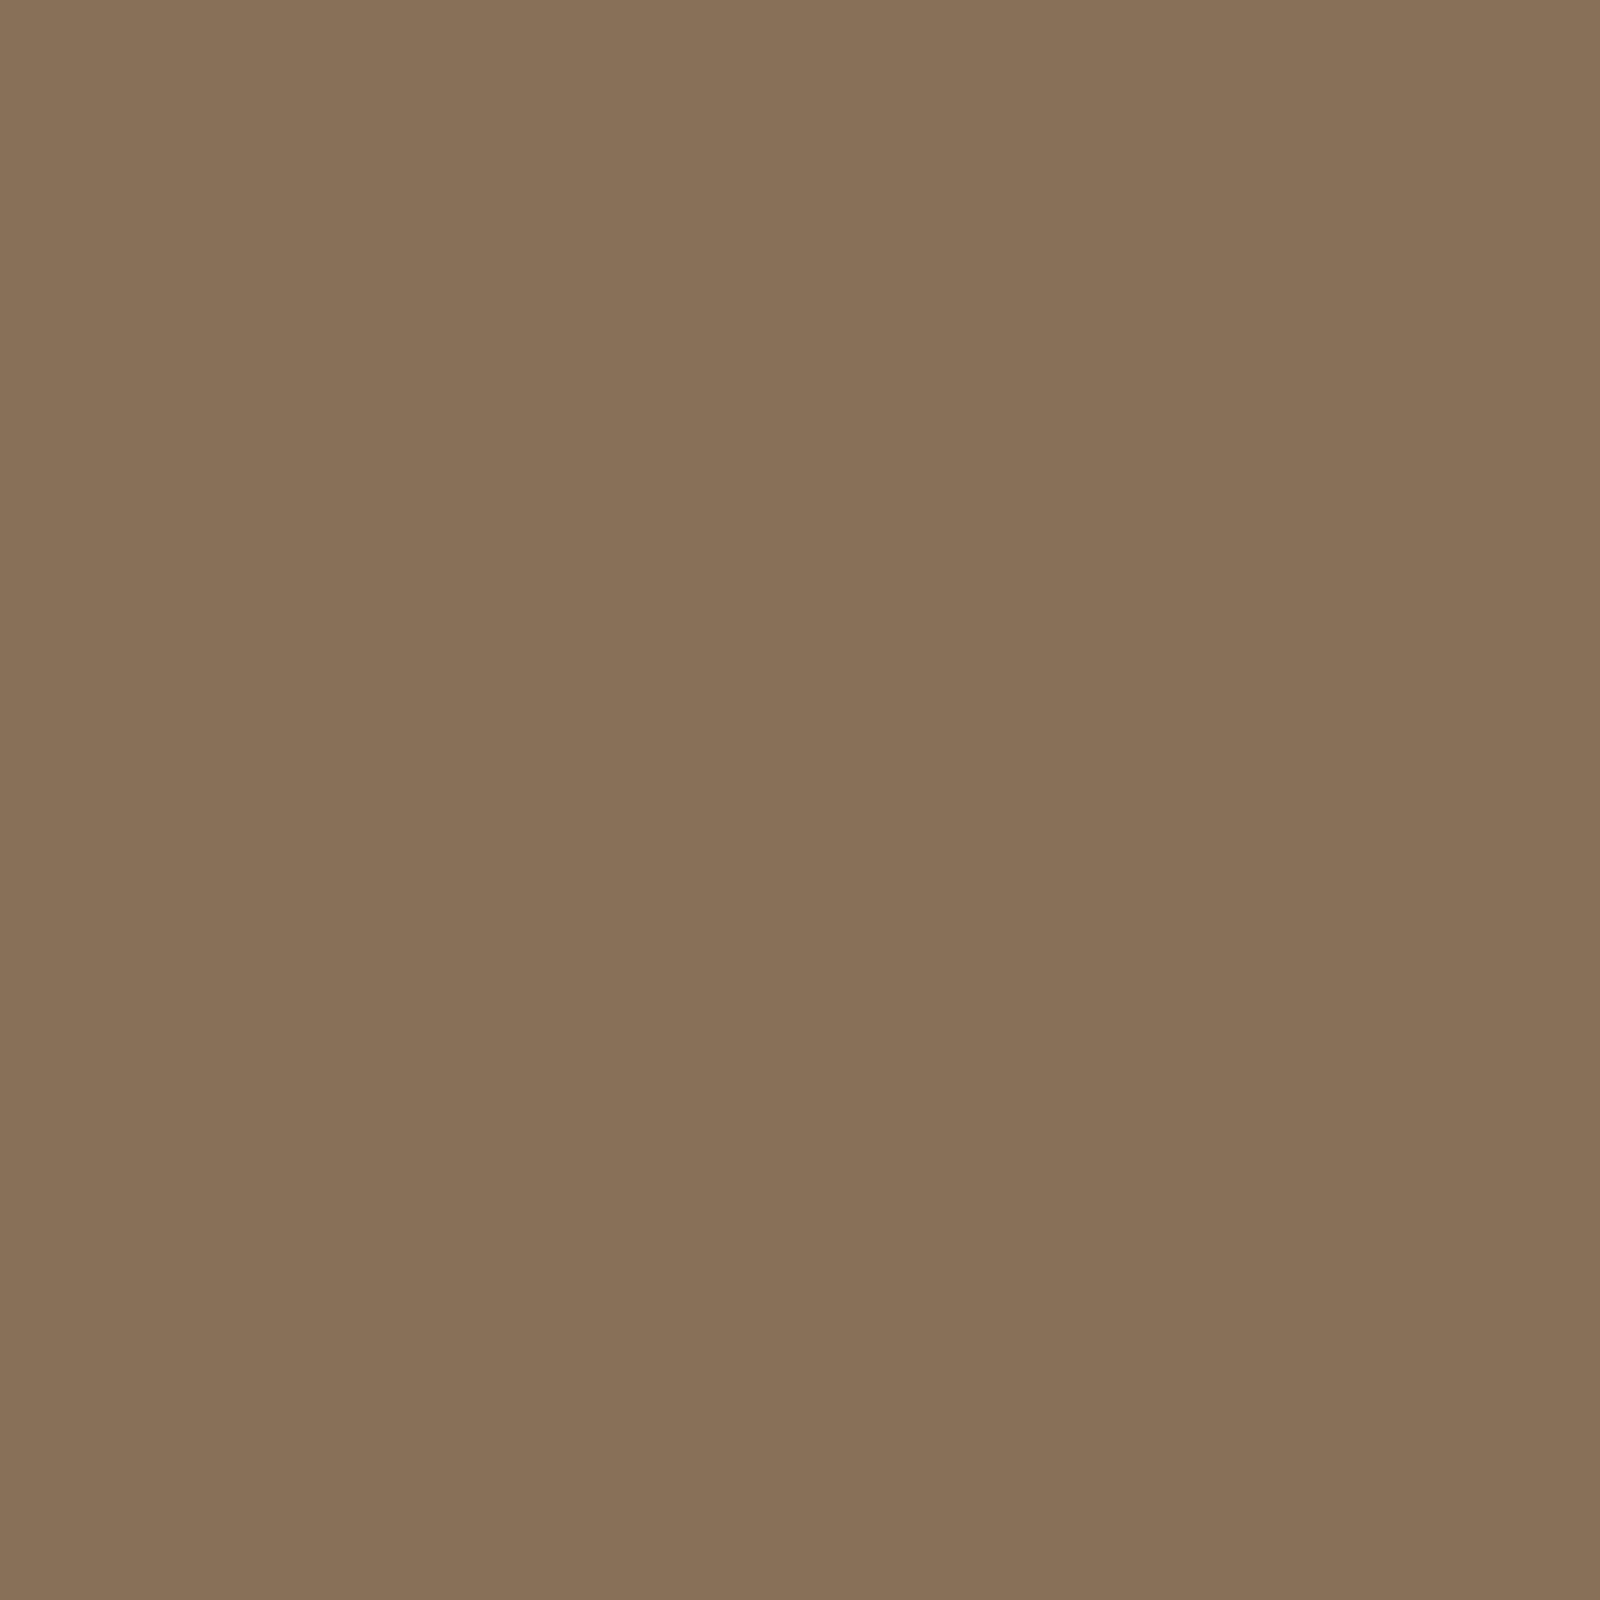 Shop Black Friday Deals On Blazing Needles 42 Inch Solid U Shape Bench Cushion Overstock 7949726